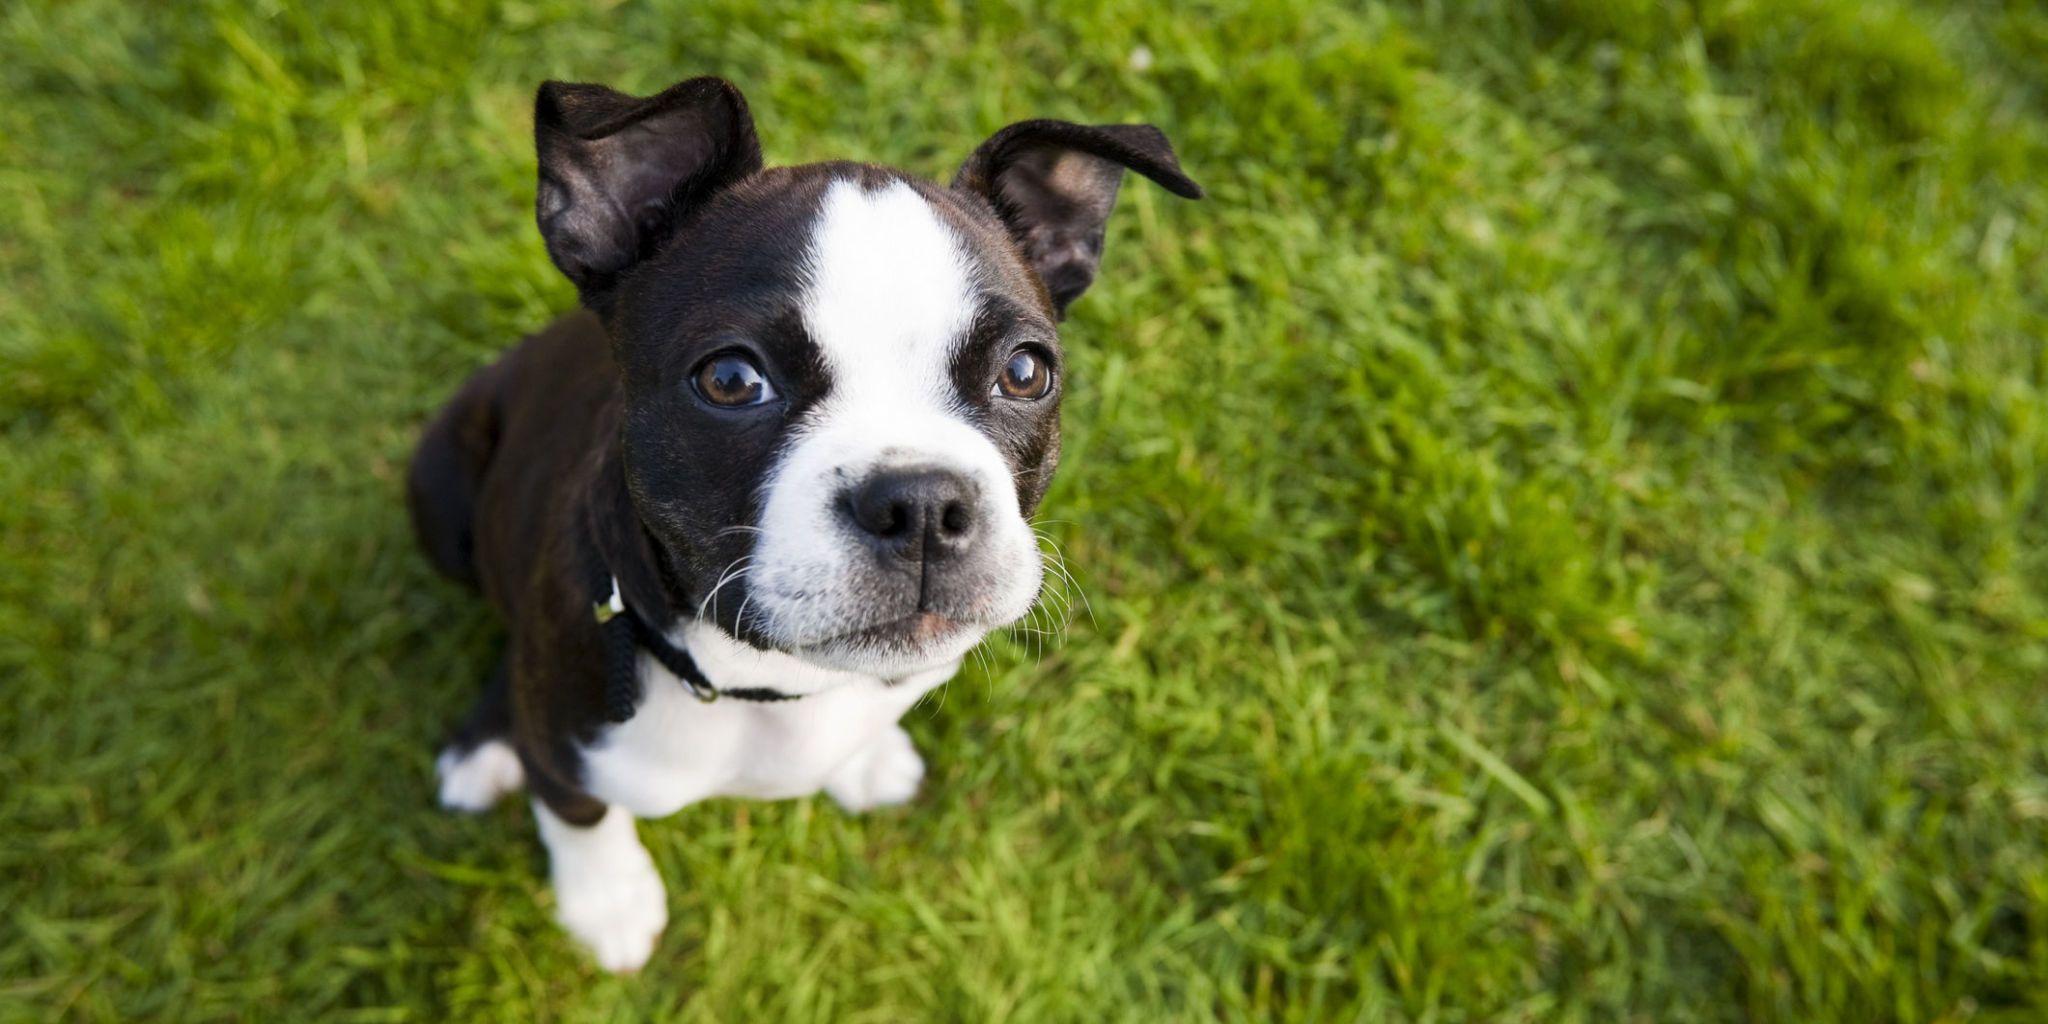 Little dog breeds pics